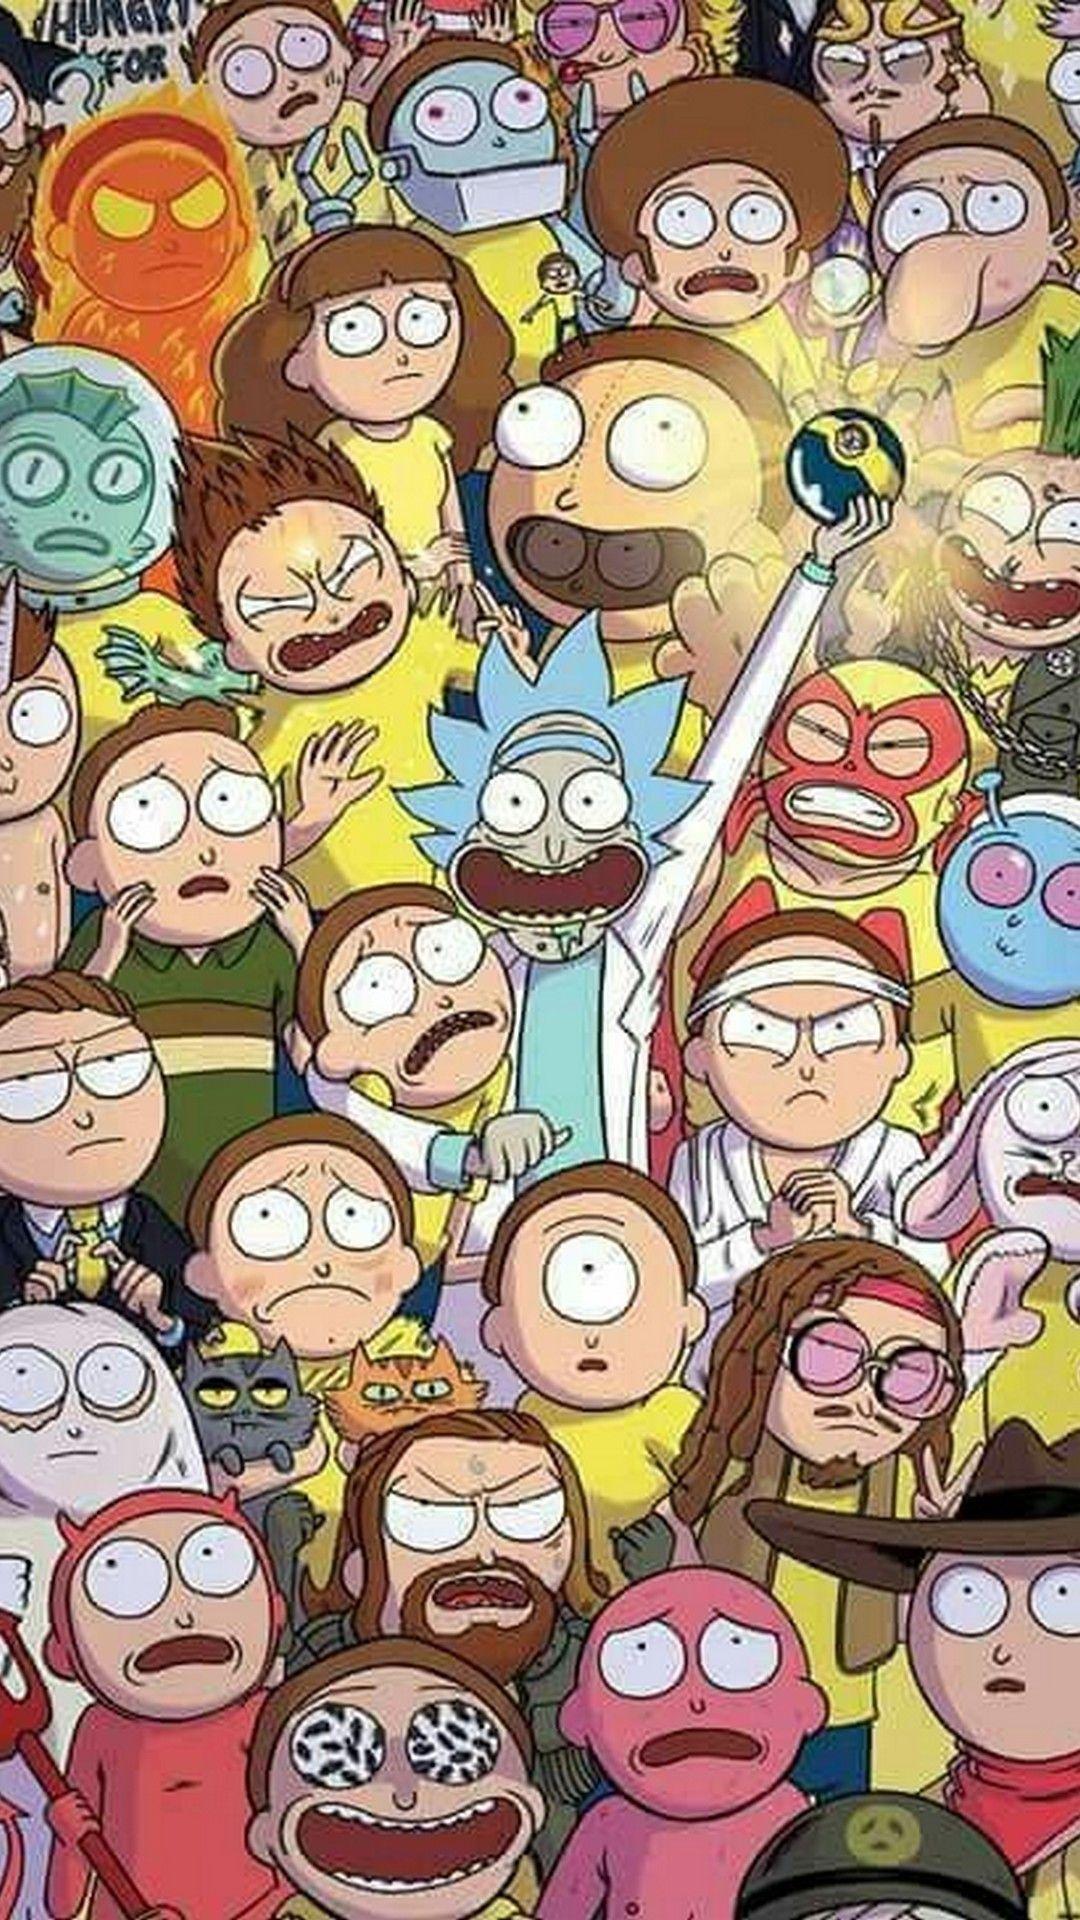 Rick And Morty Hd Wallpapers Top Free Rick And Morty Hd Backgrounds Wallpaperaccess Rick And Morty Poster Cartoon Wallpaper Rick I Morty